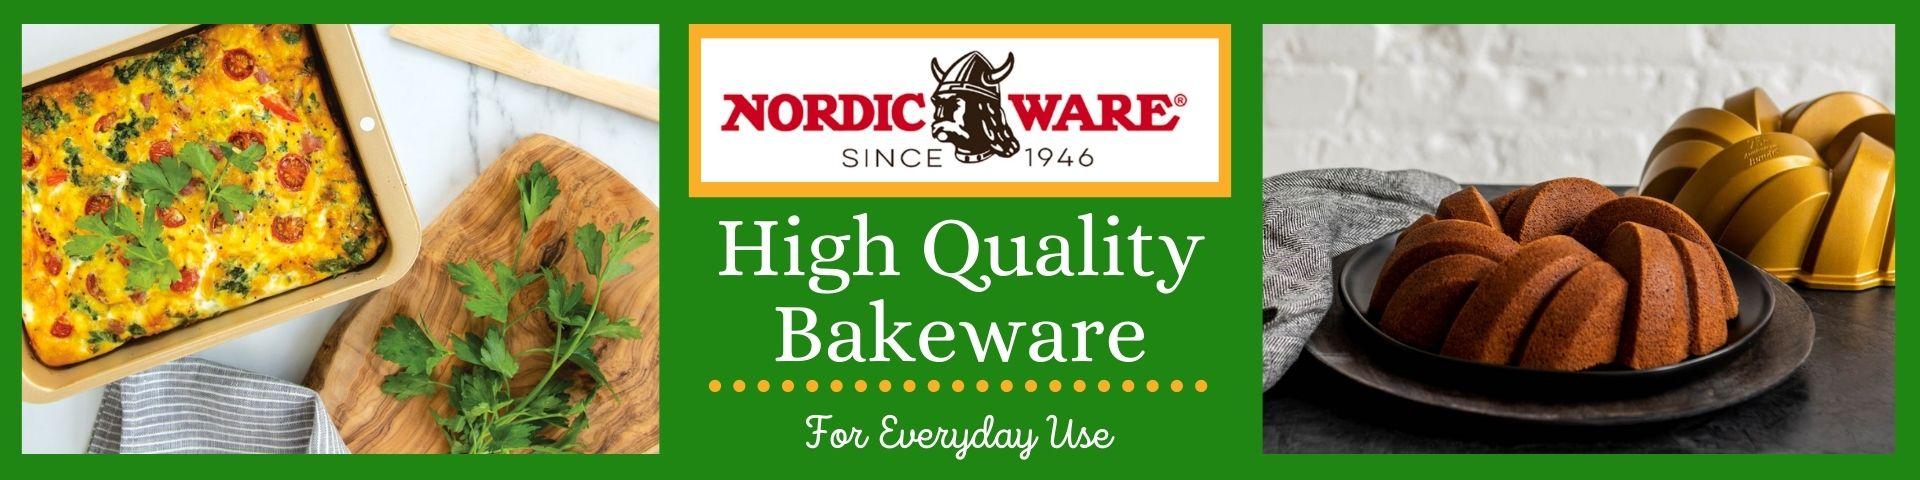 Cornucopia-Kirkwood-nordicware-high-quality-bakeware-St-Louis